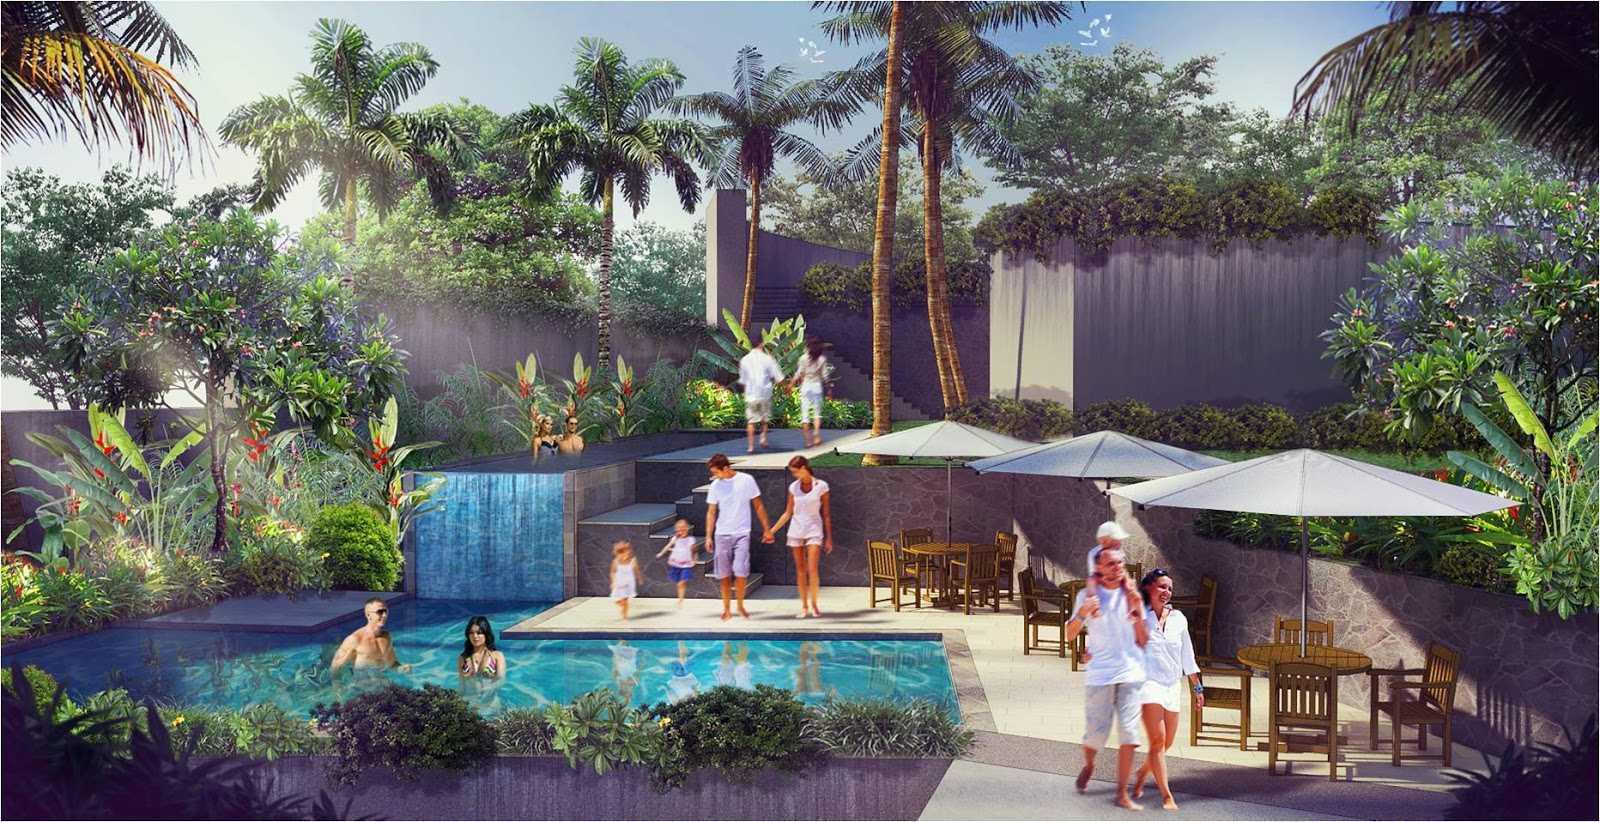 Hg Architects & Designers Associates Denbantas Riverview Residences Tabanan, Bali Tabanan, Bali Swimming Pool Area   24191